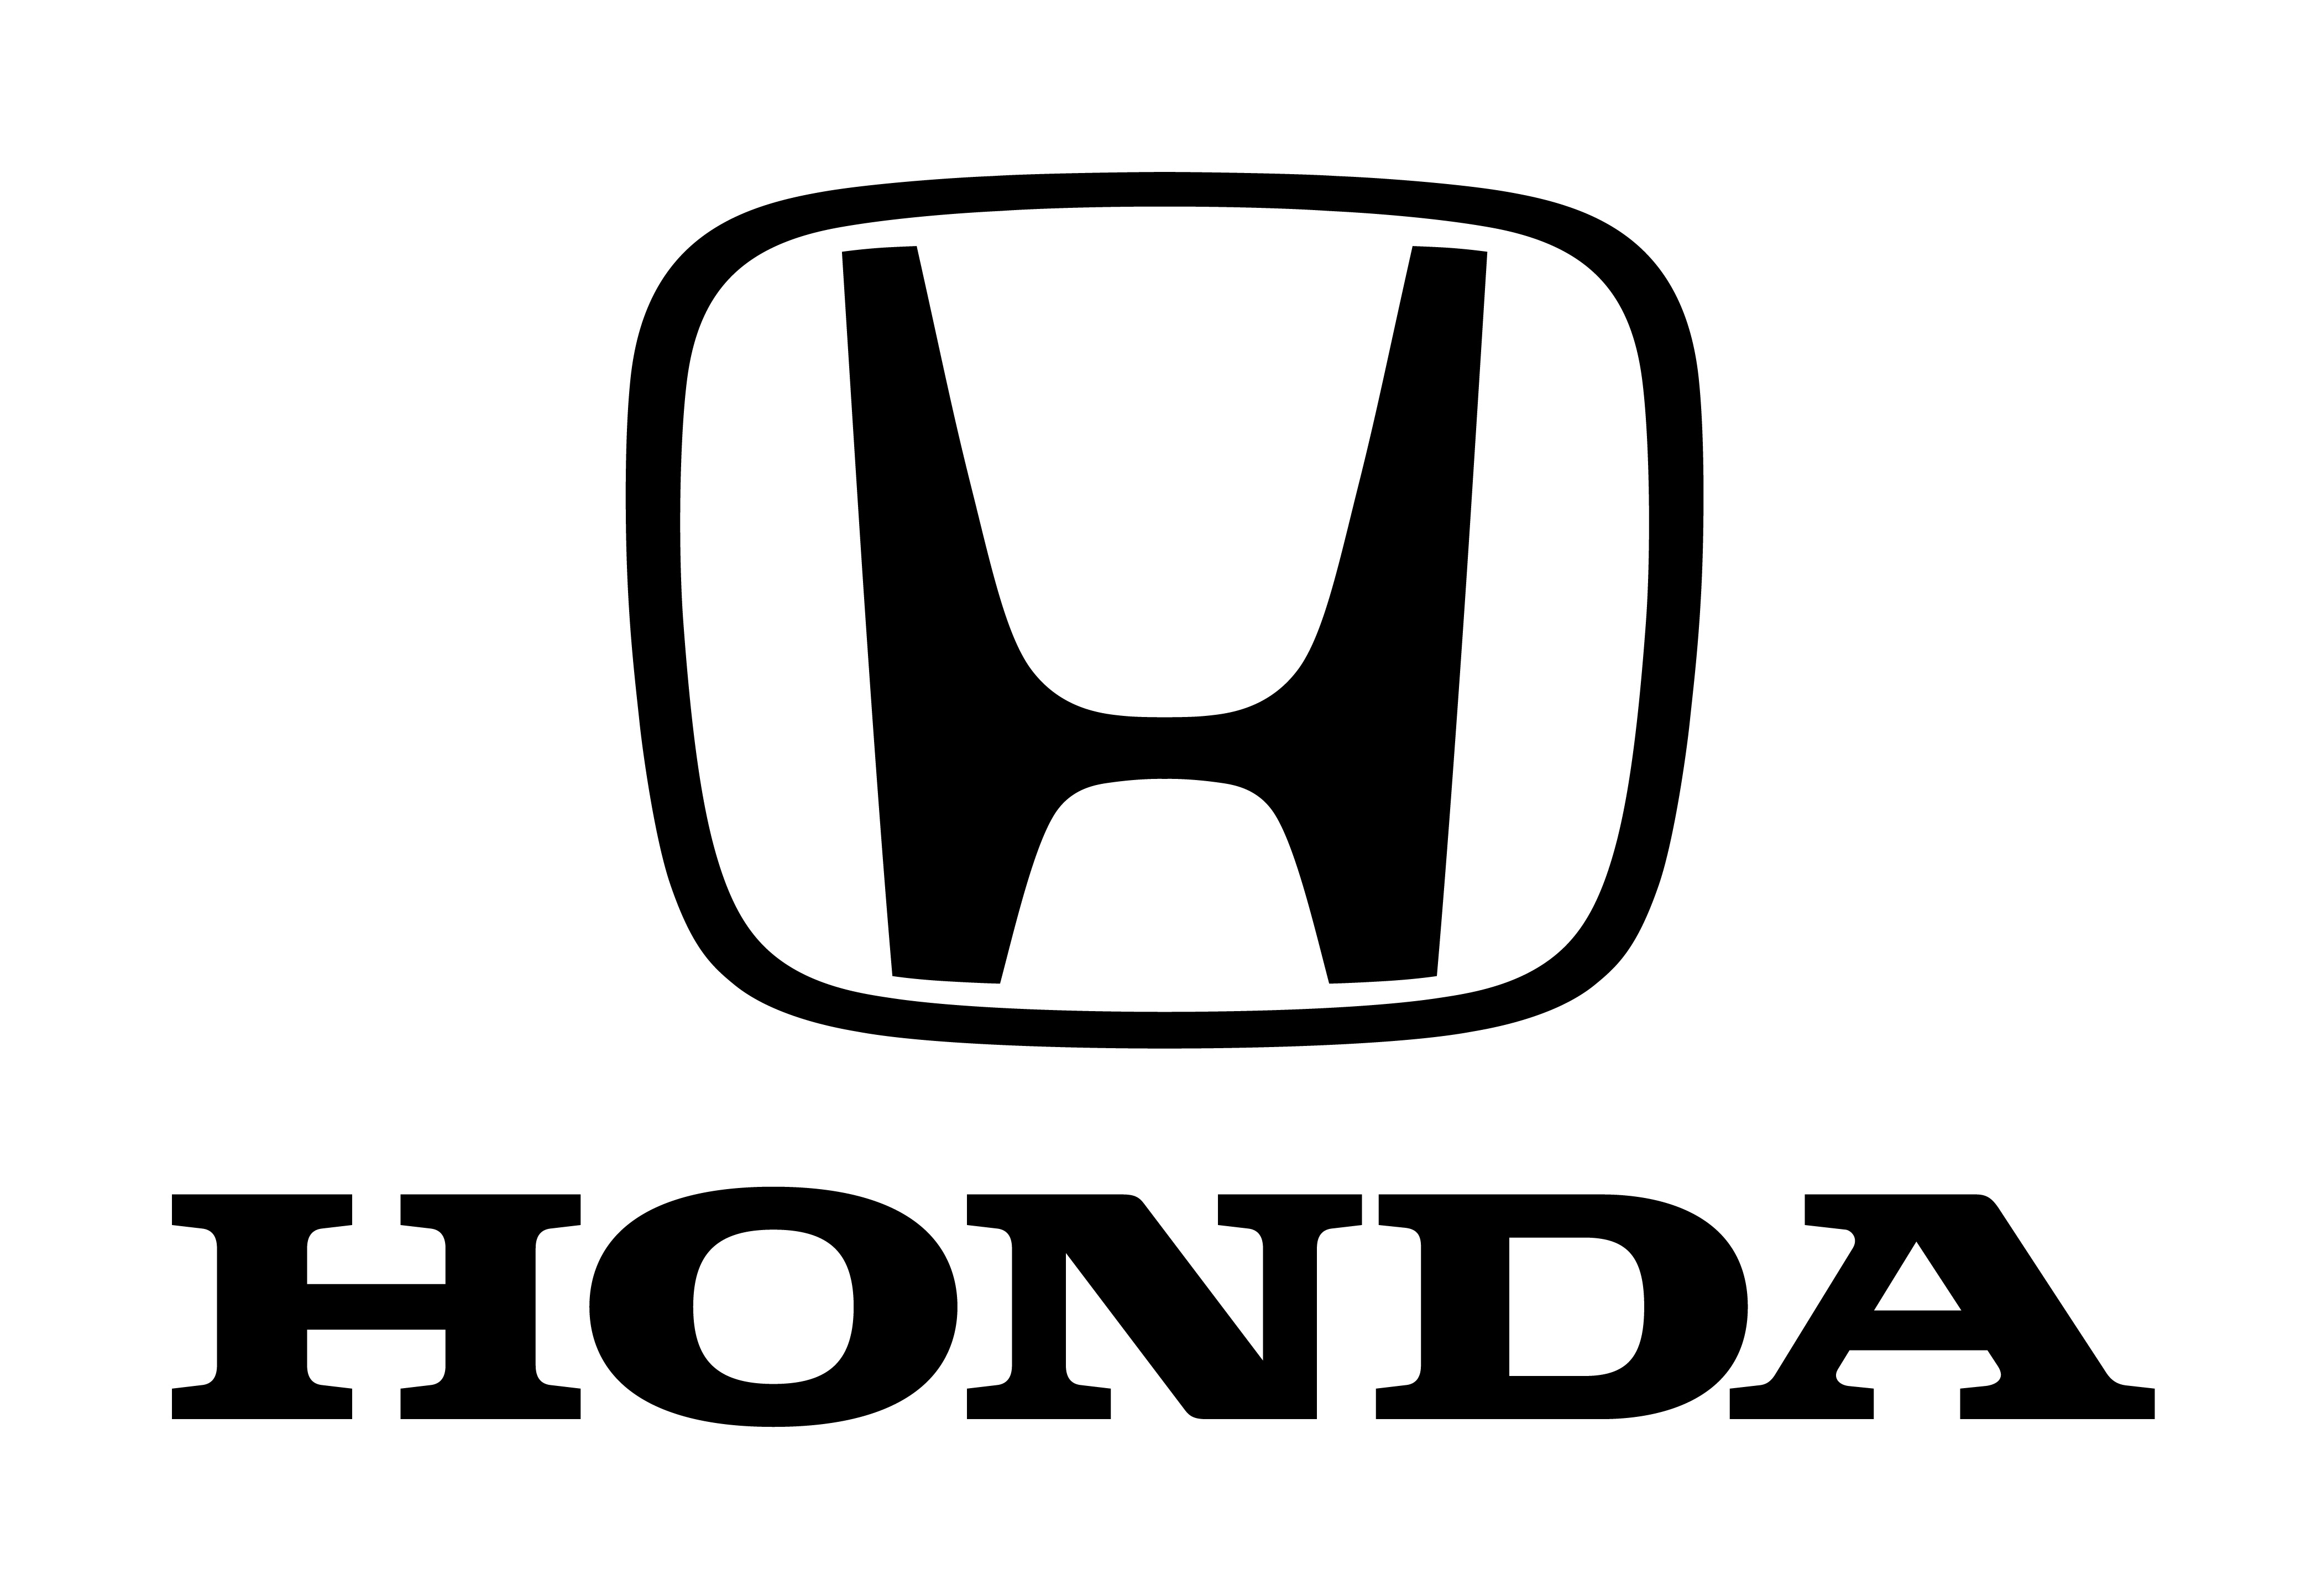 E Honda Clipart.